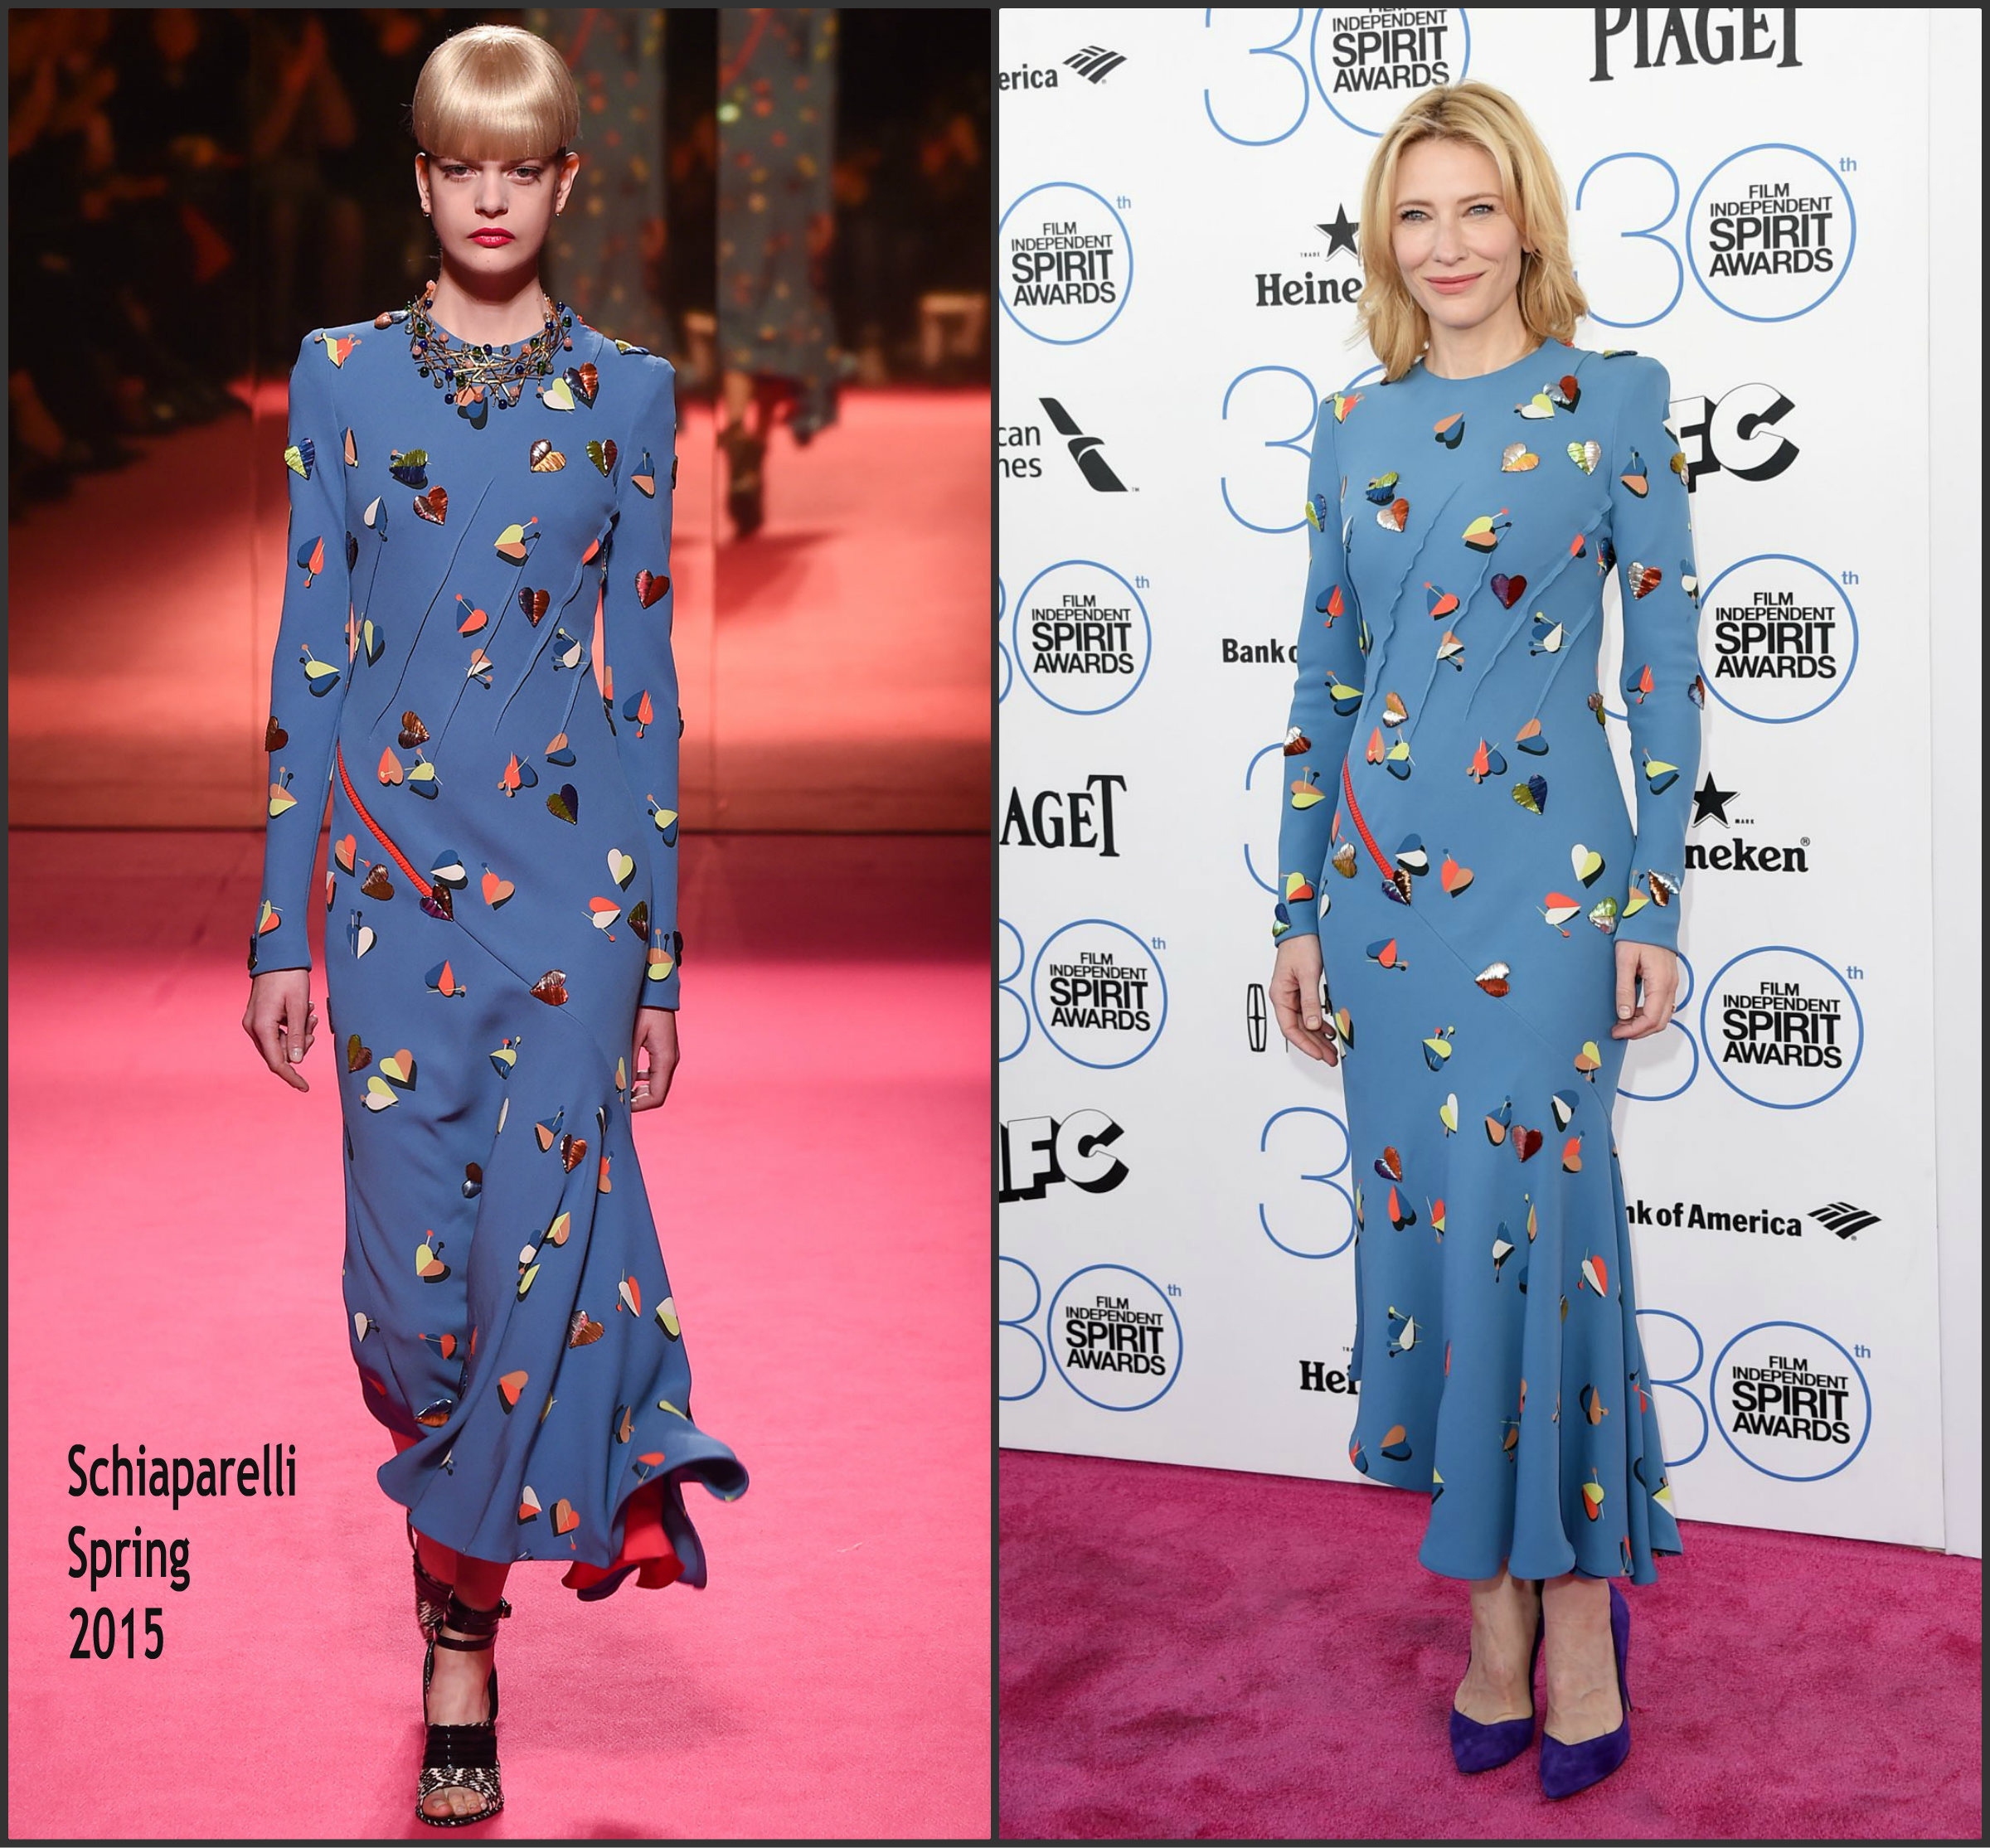 cate-Blanchett-in-Schiaparelli-2015-film-independent-spirit-awards